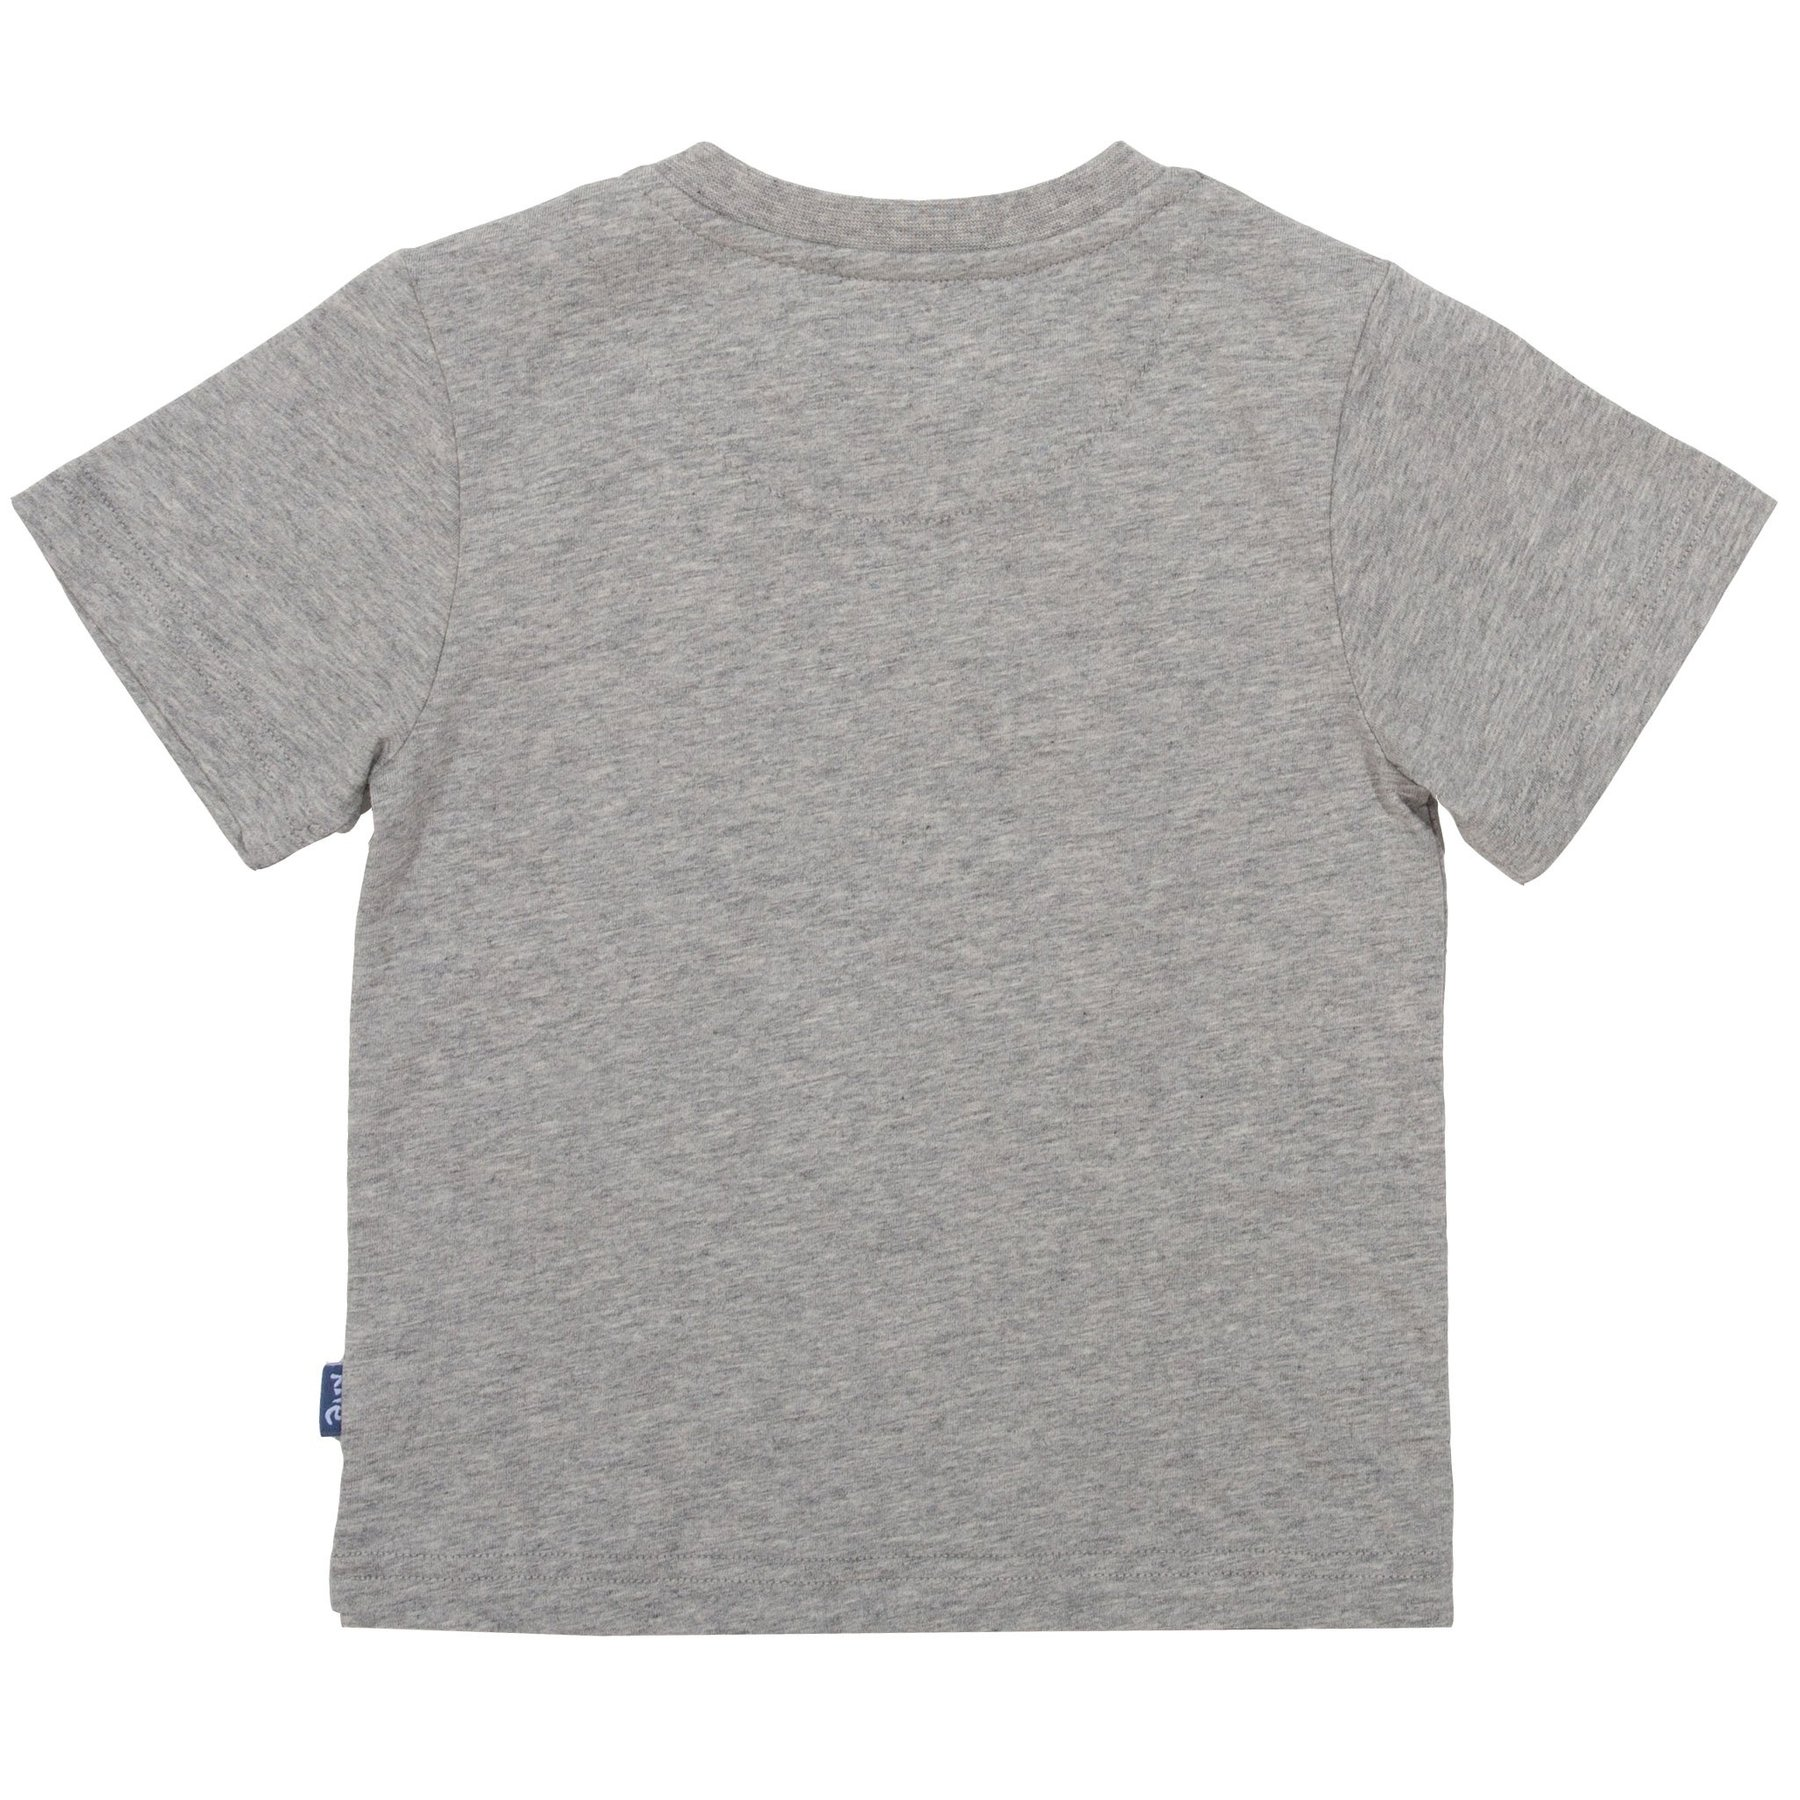 T-Shirt, graumeliert, Äffchen